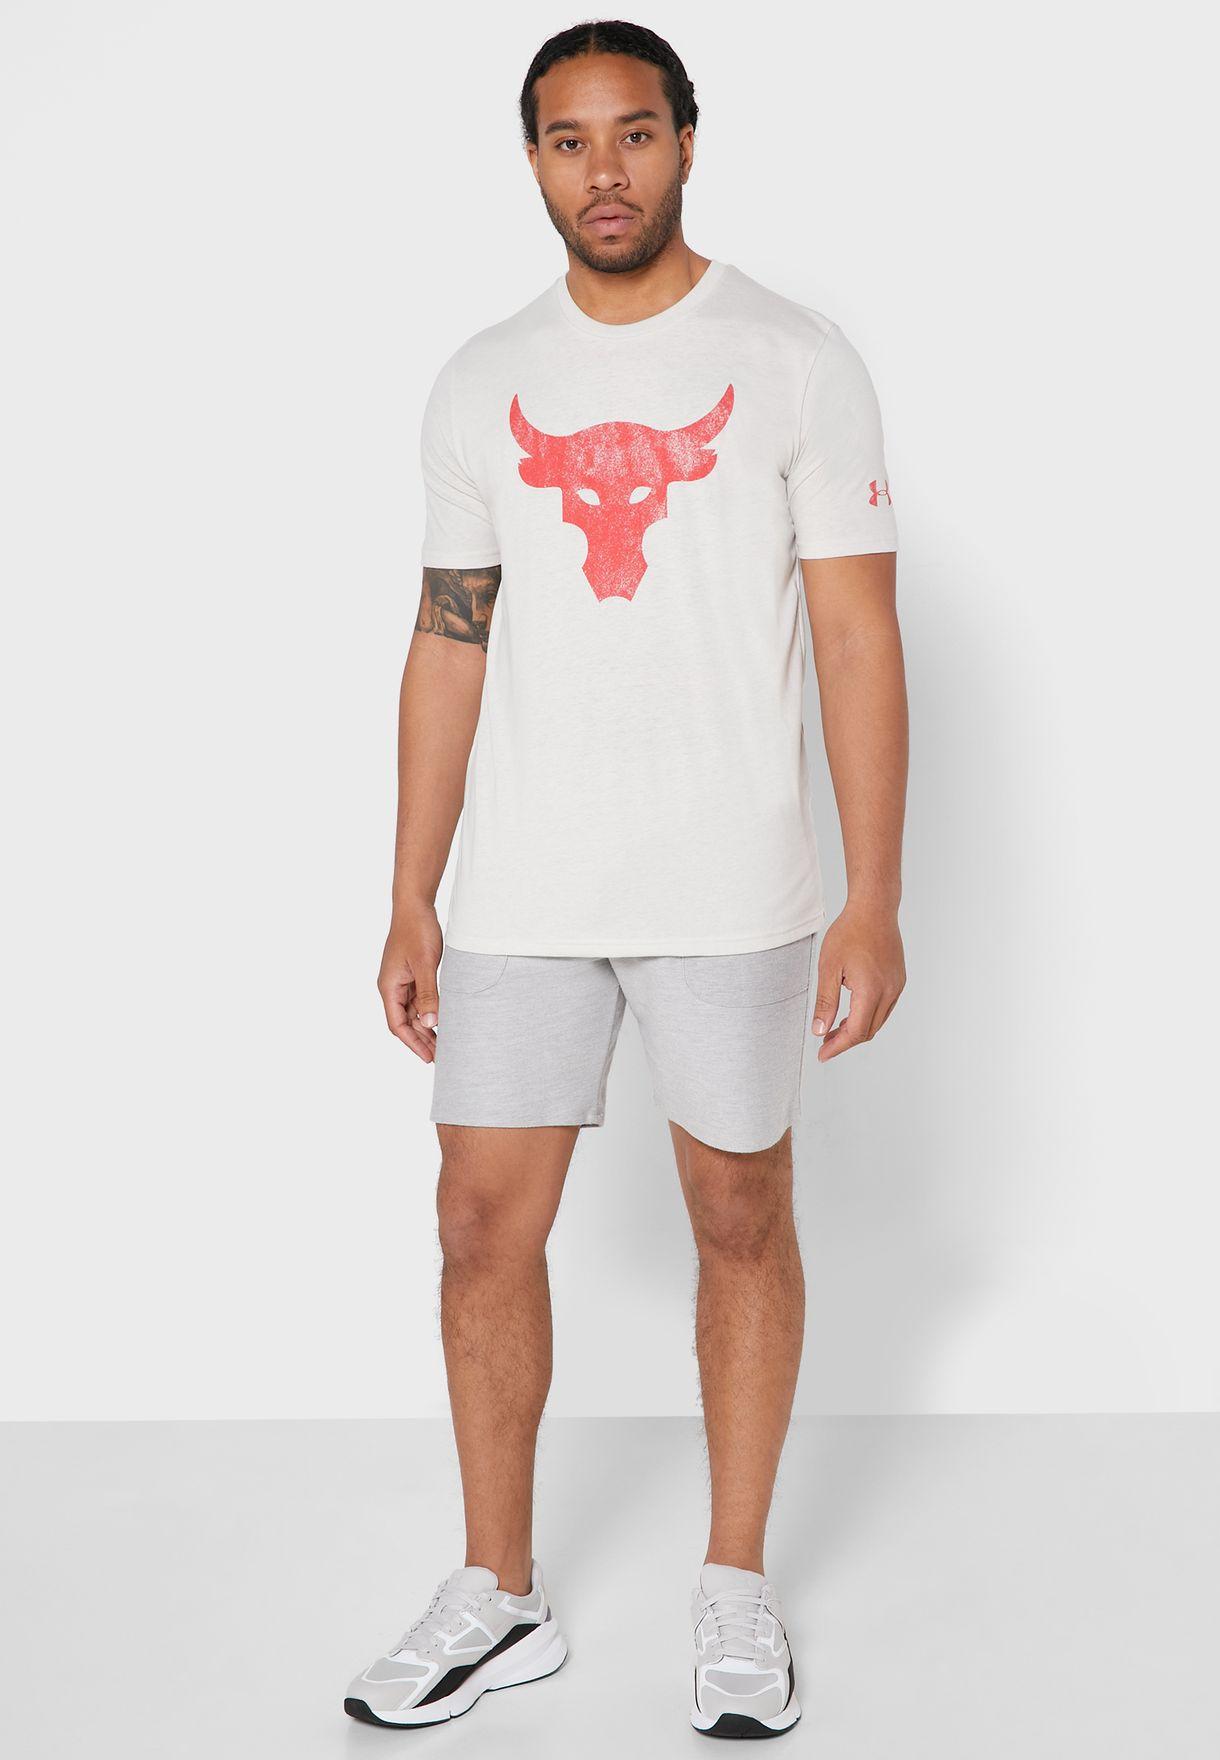 Under Armour Project Rock Brahma Bull T-shirt - Fashion